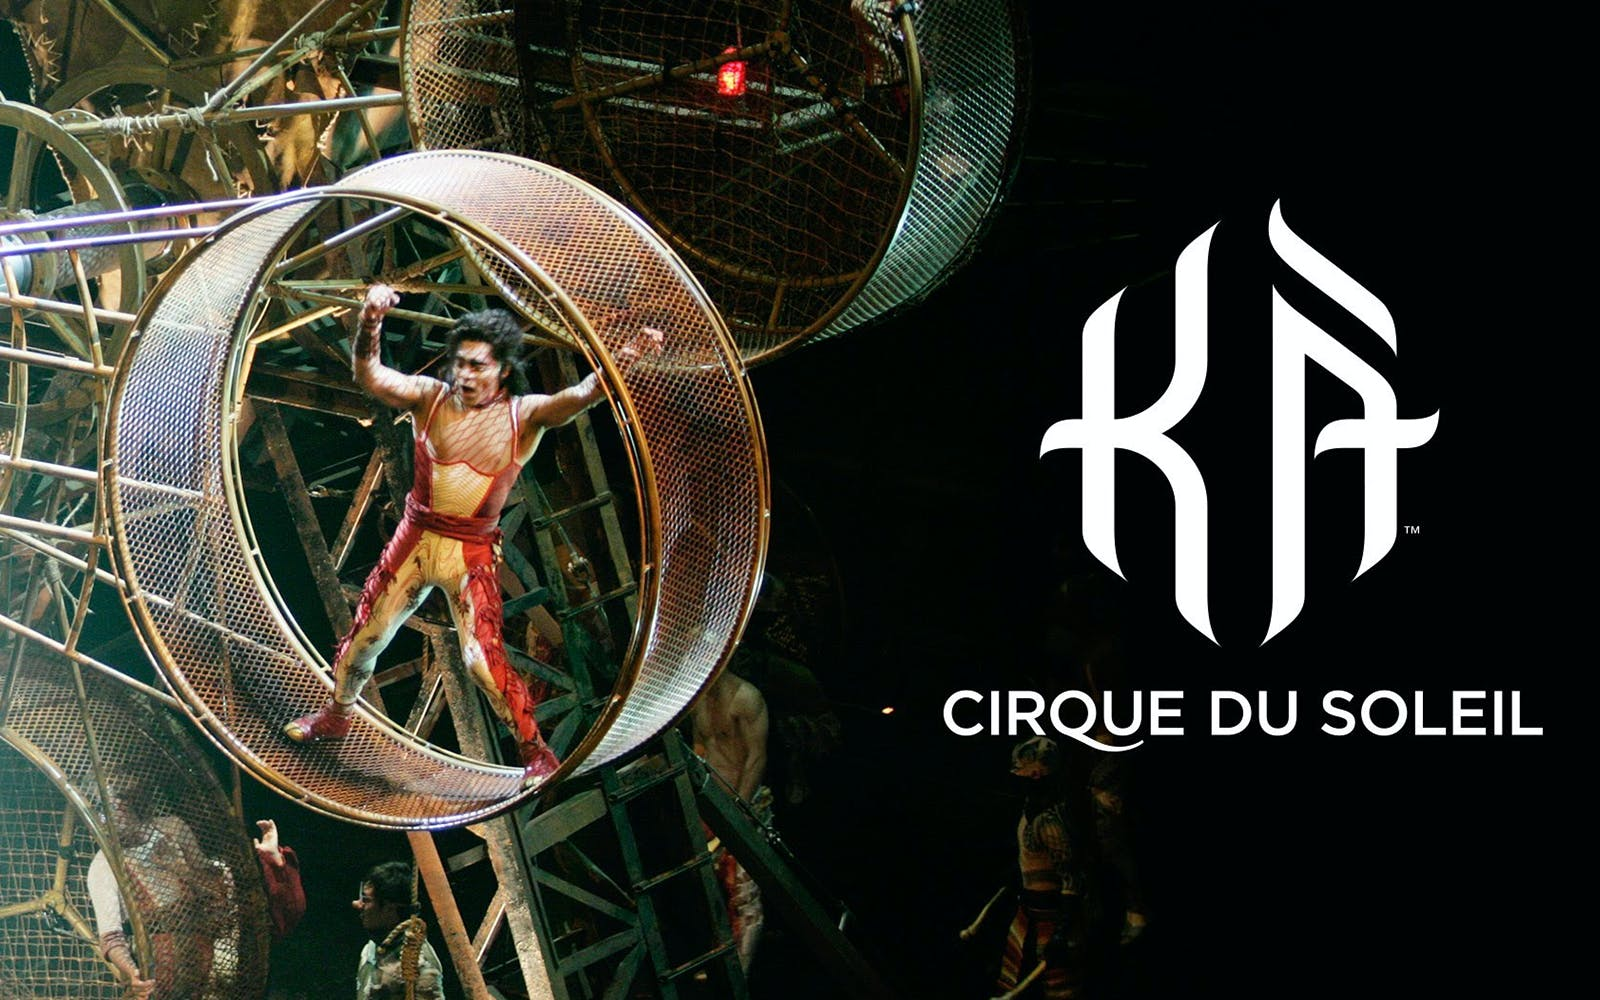 Ka cirque du Soleil - 1